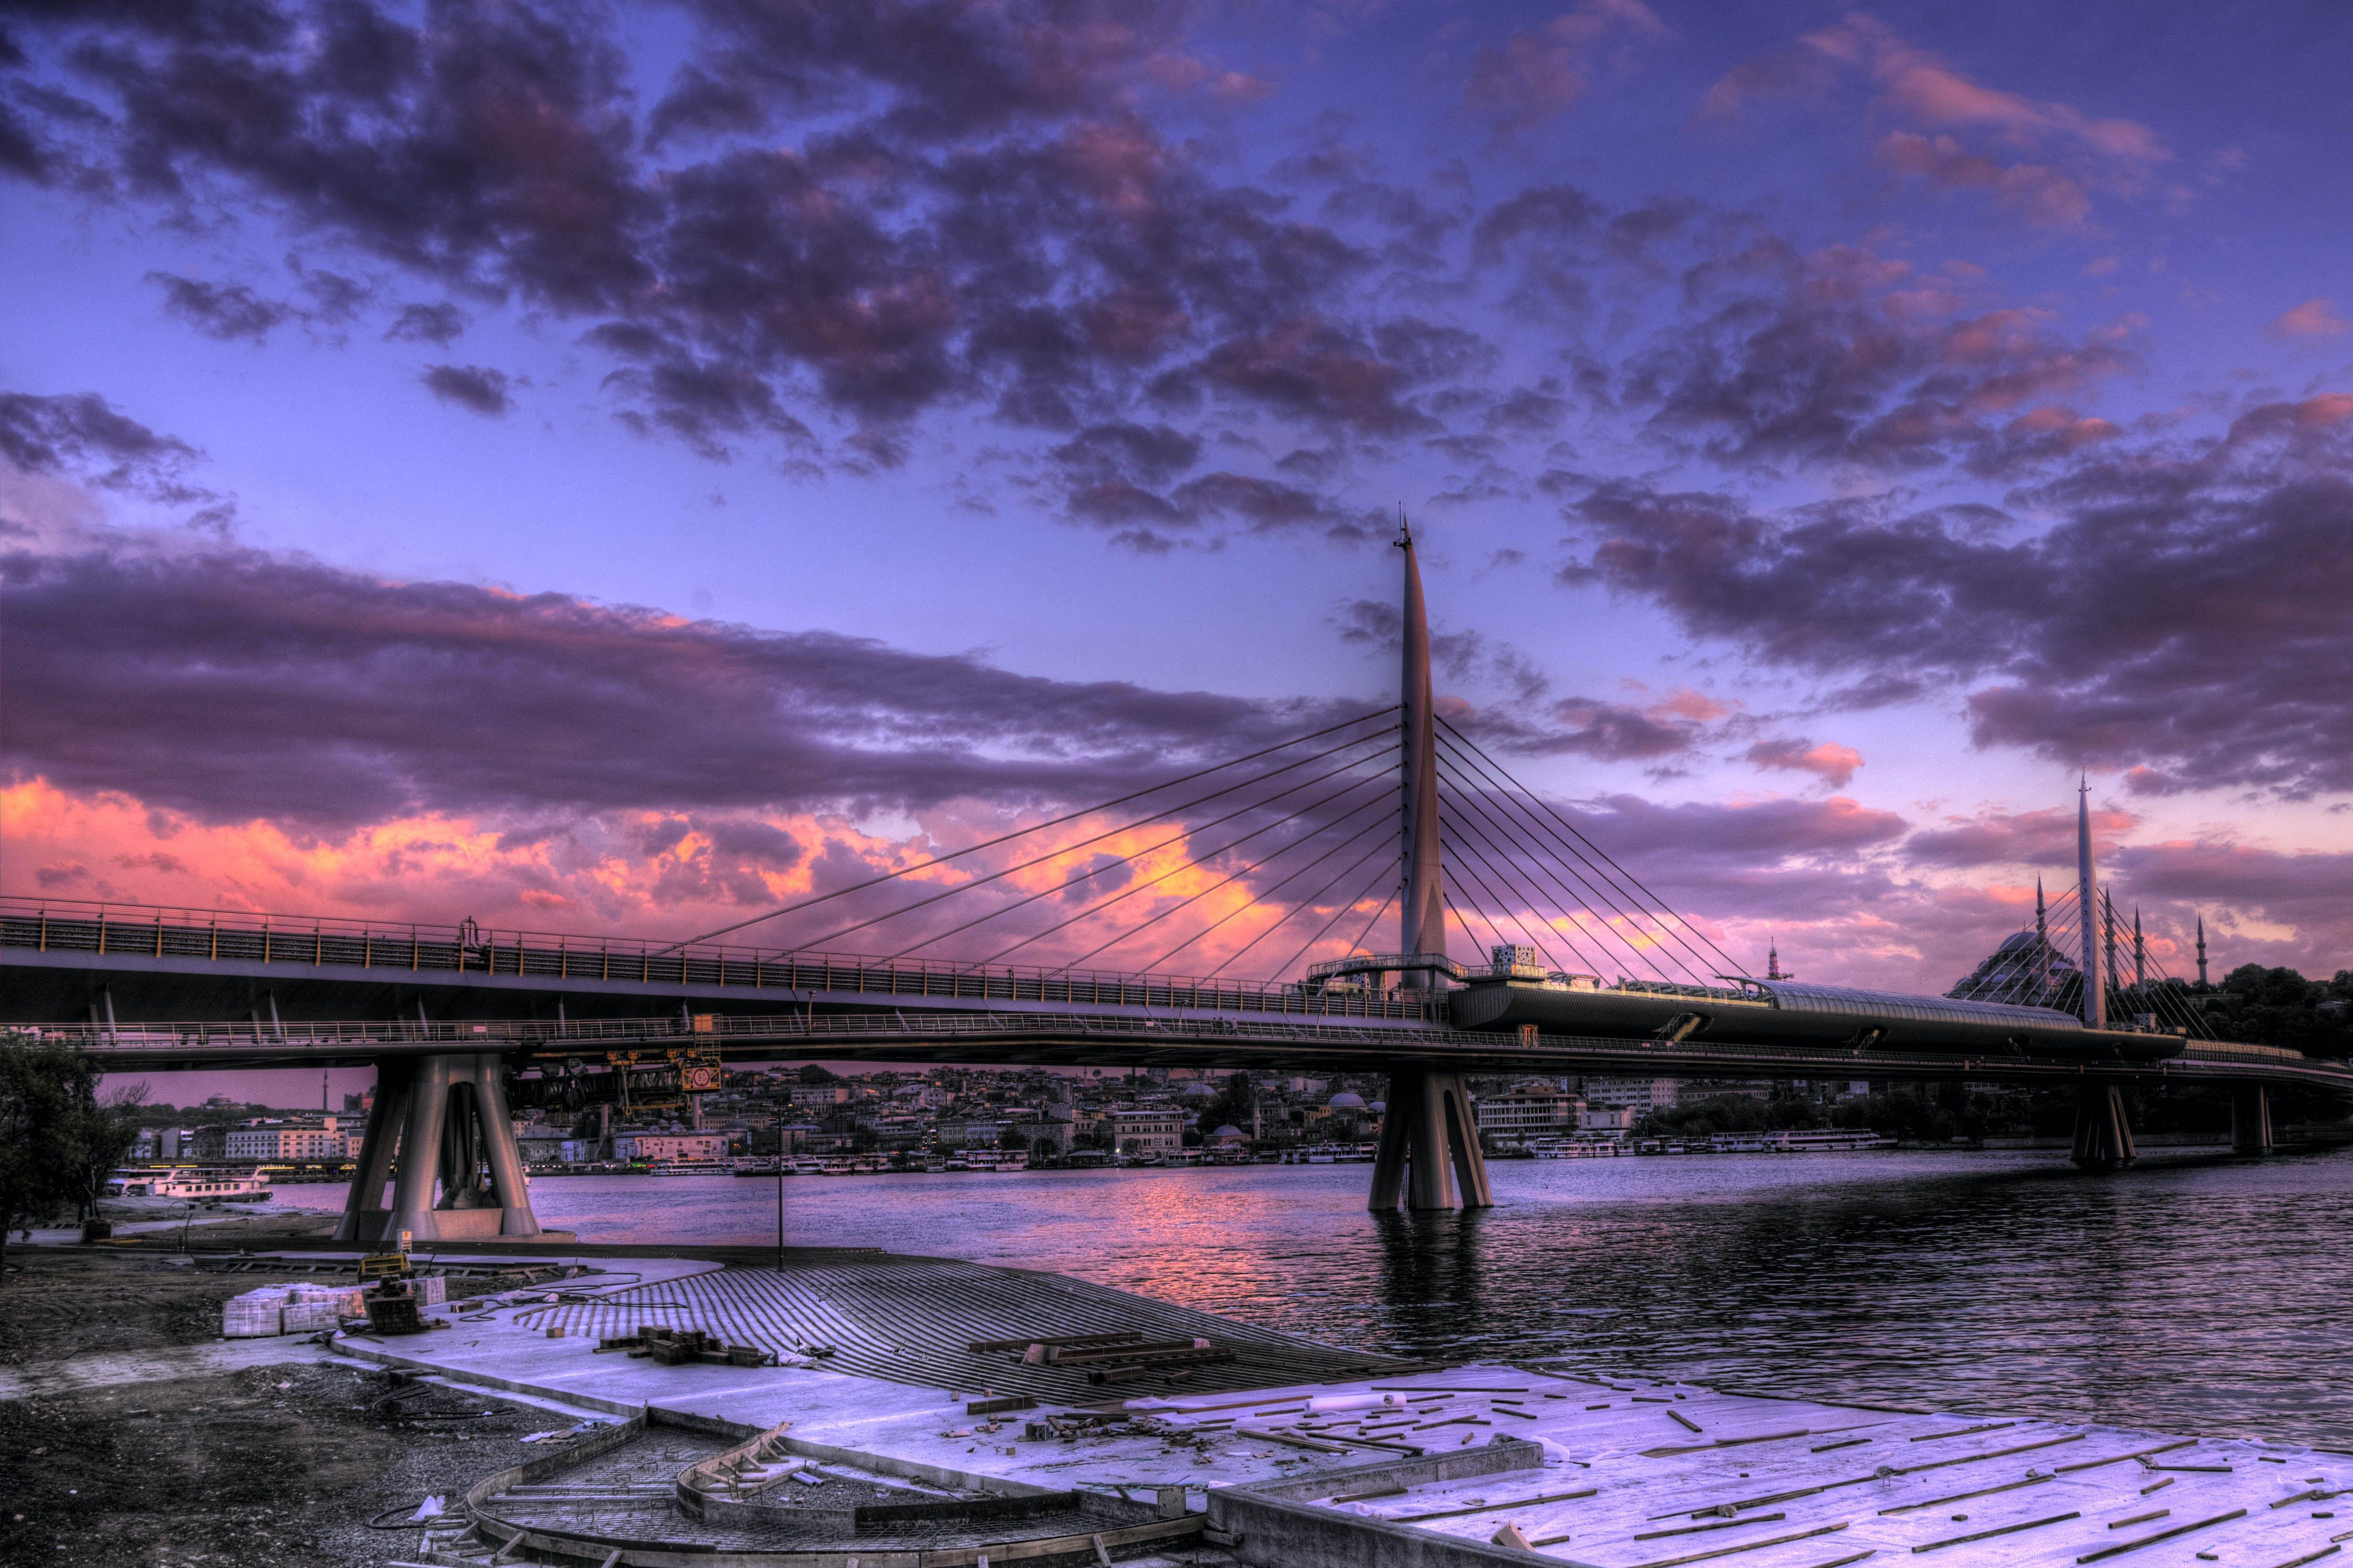 Black Bridge and River